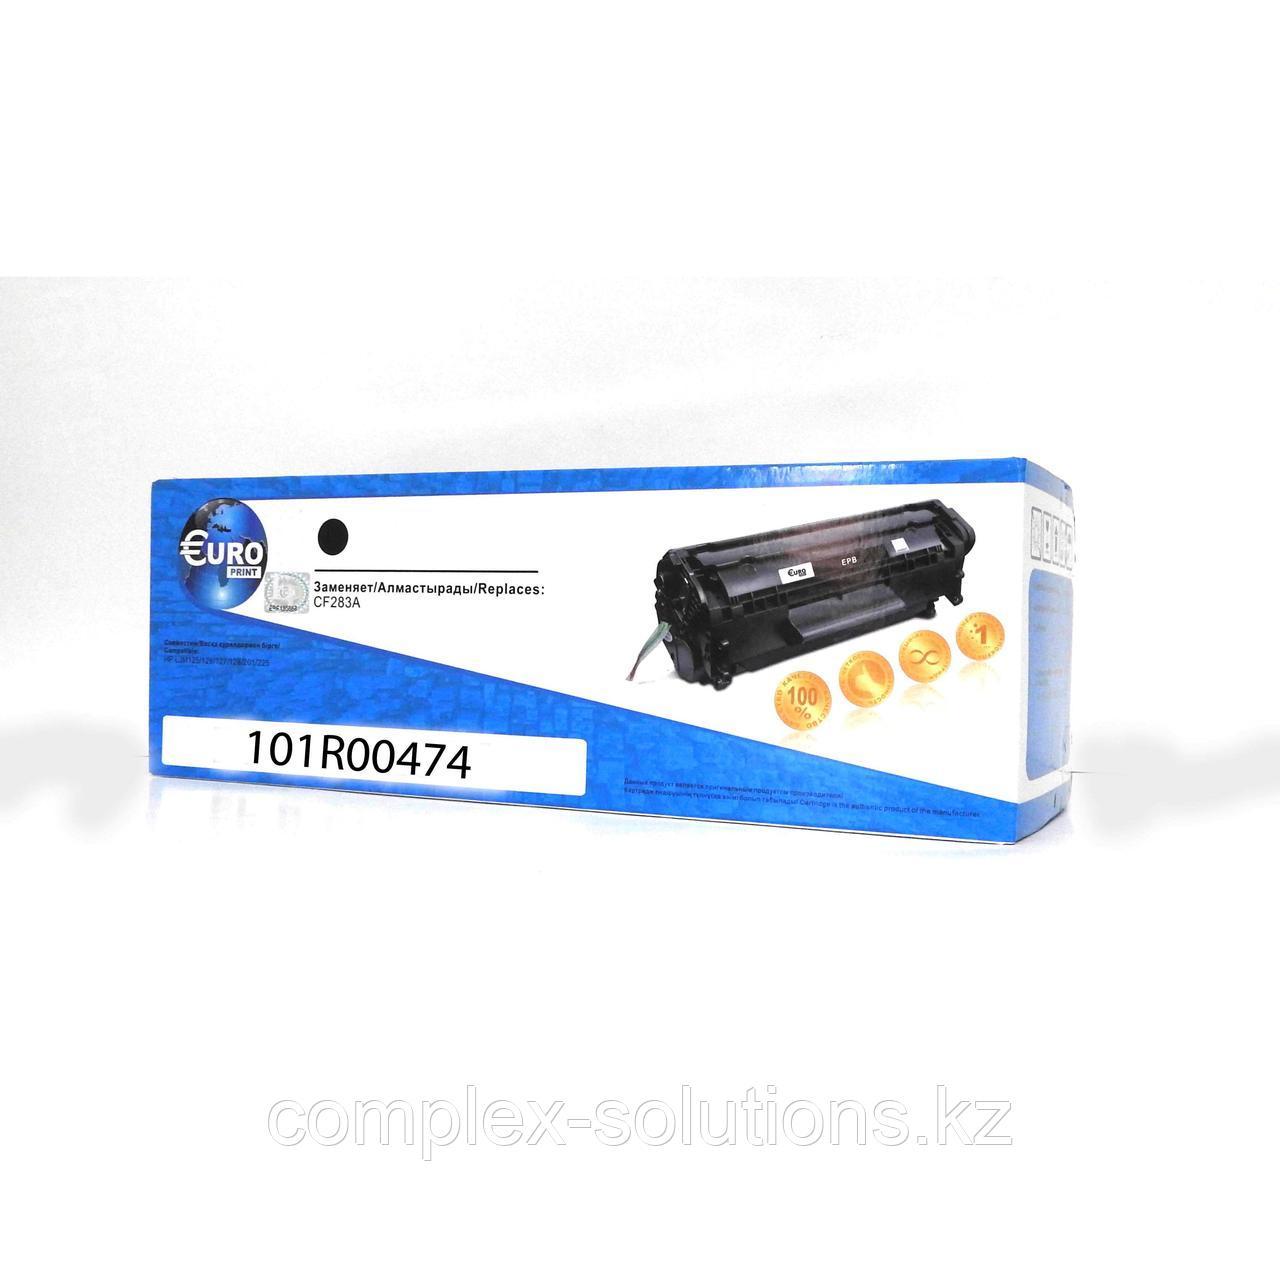 Drum   Драм картридж XEROX (101R00474) Phaser 3052   3260 WC 3215   3225 (10k) Euro Print   [качественный